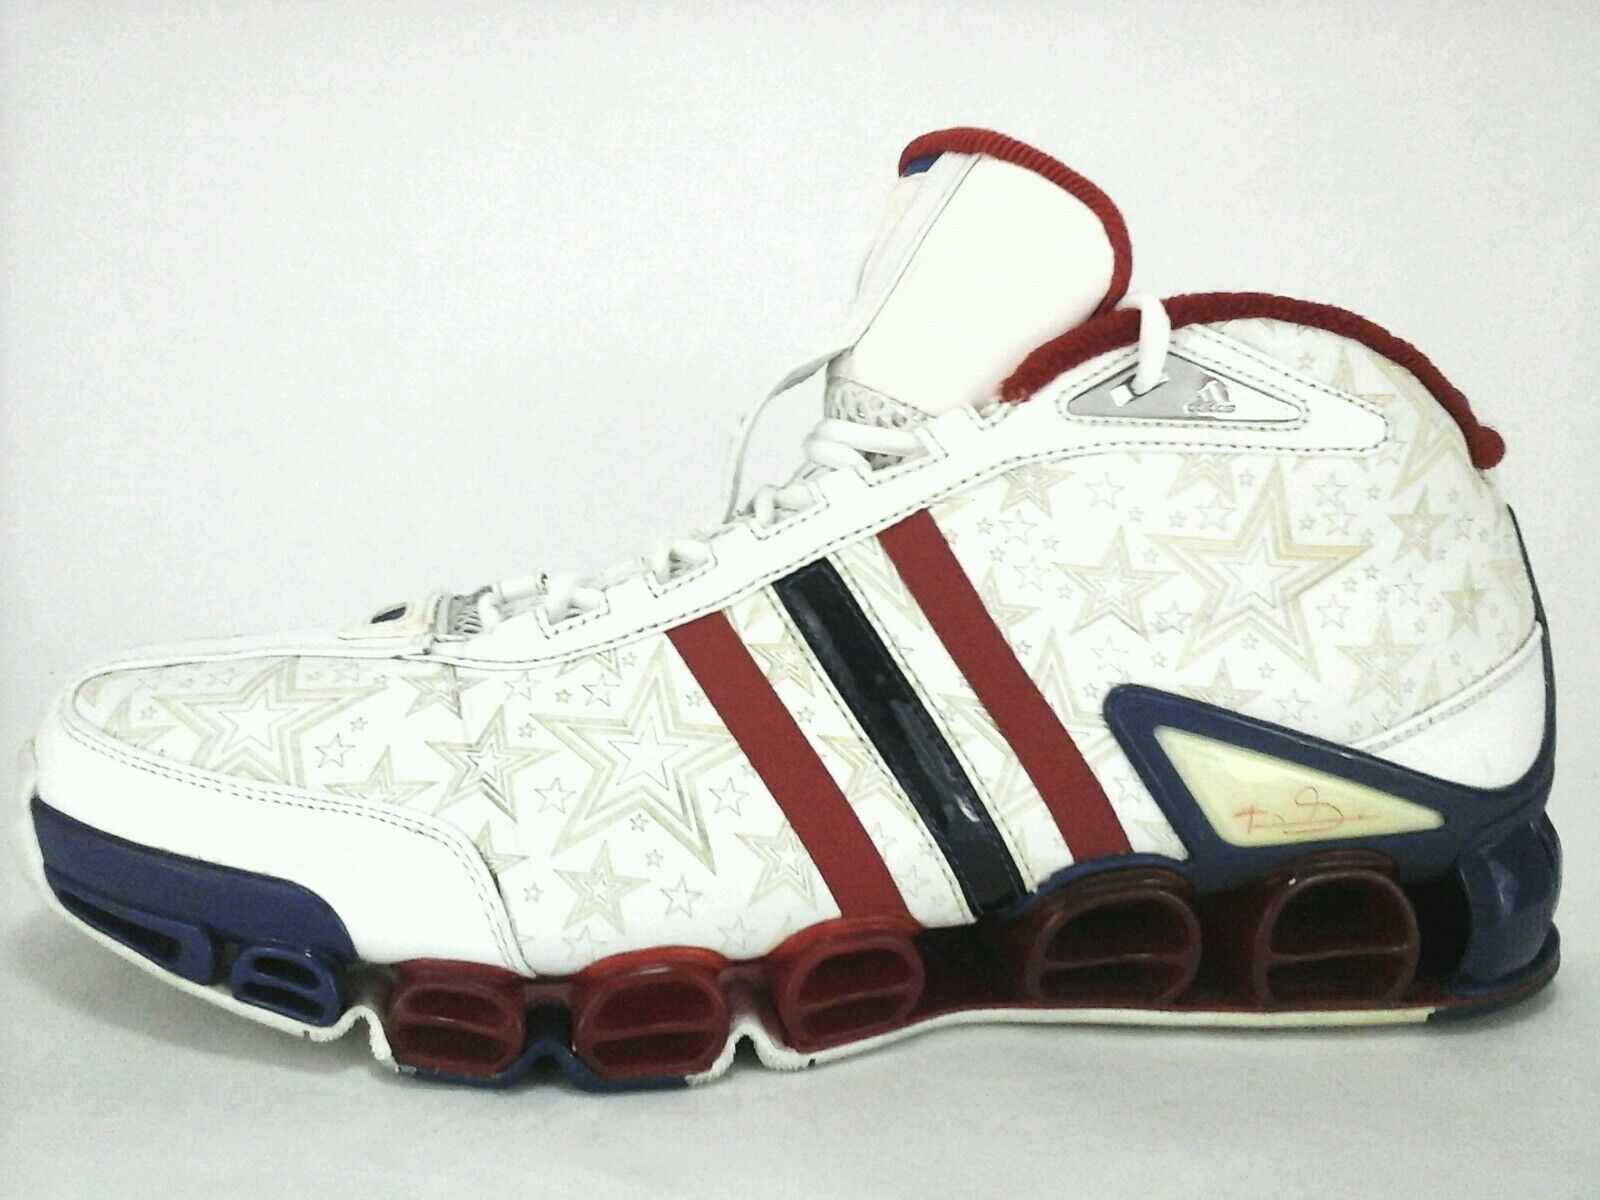 pretty nice 4e882 0c875 RARE 2005 Adidas KEVIN GARNETT 2Malik All Star Game Basketball Shoes US 15  EU 51